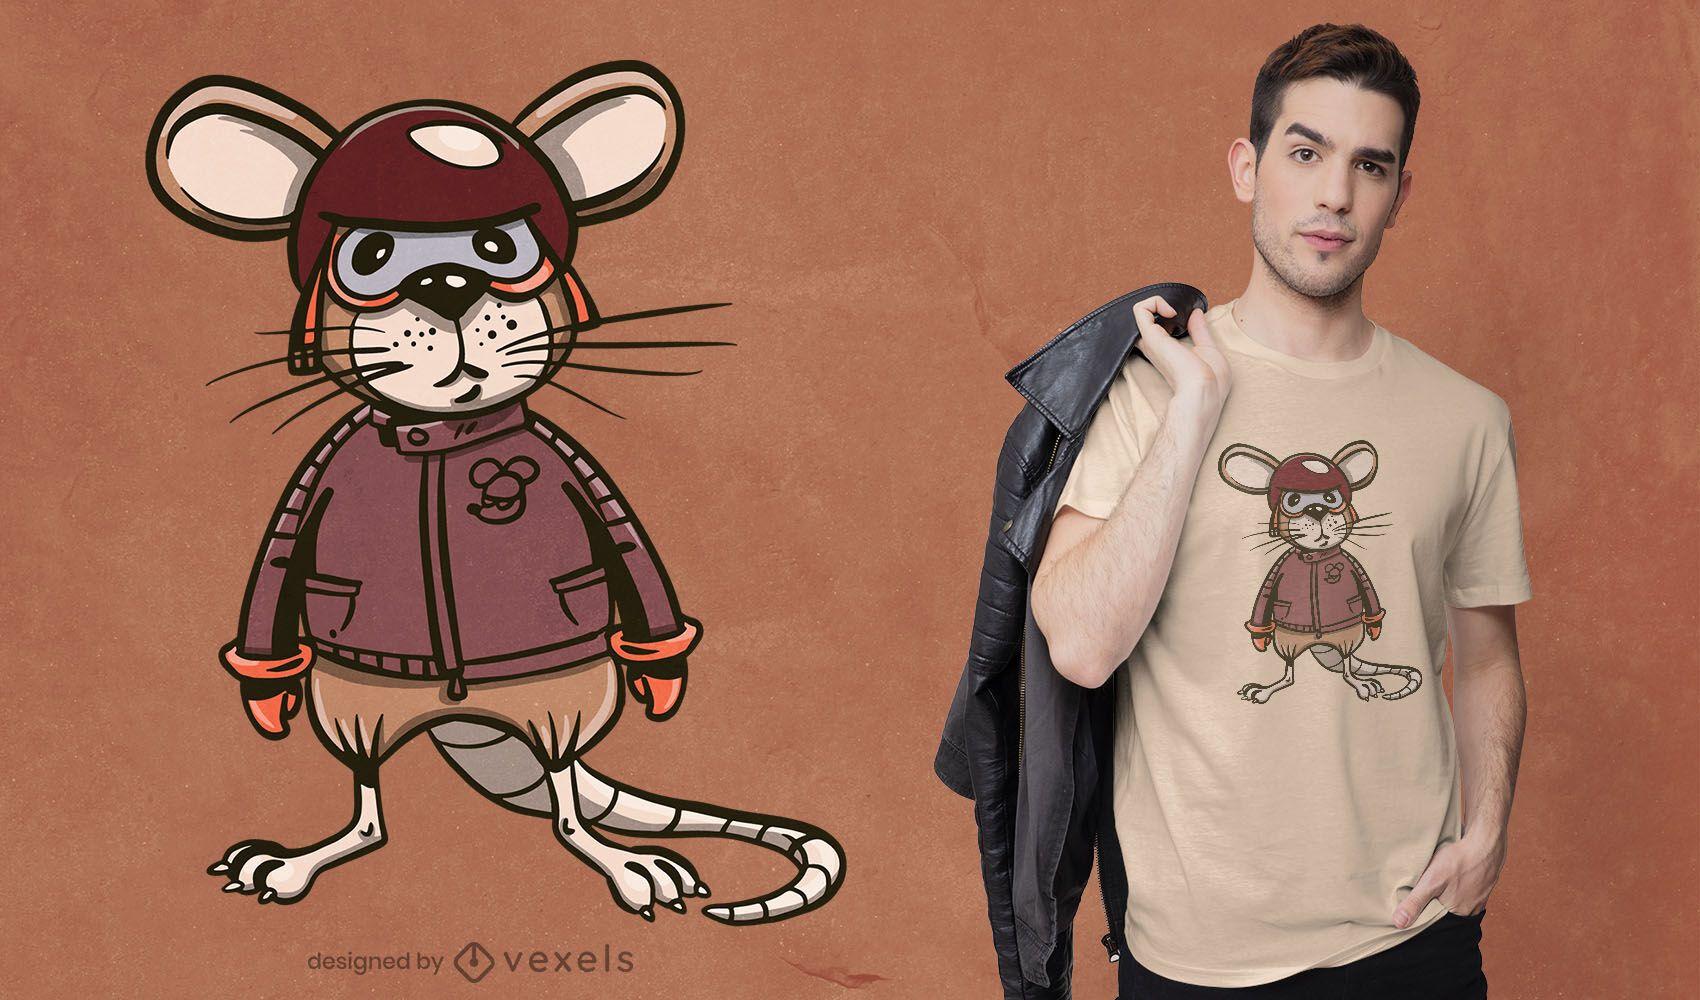 Biker rat t-shirt design